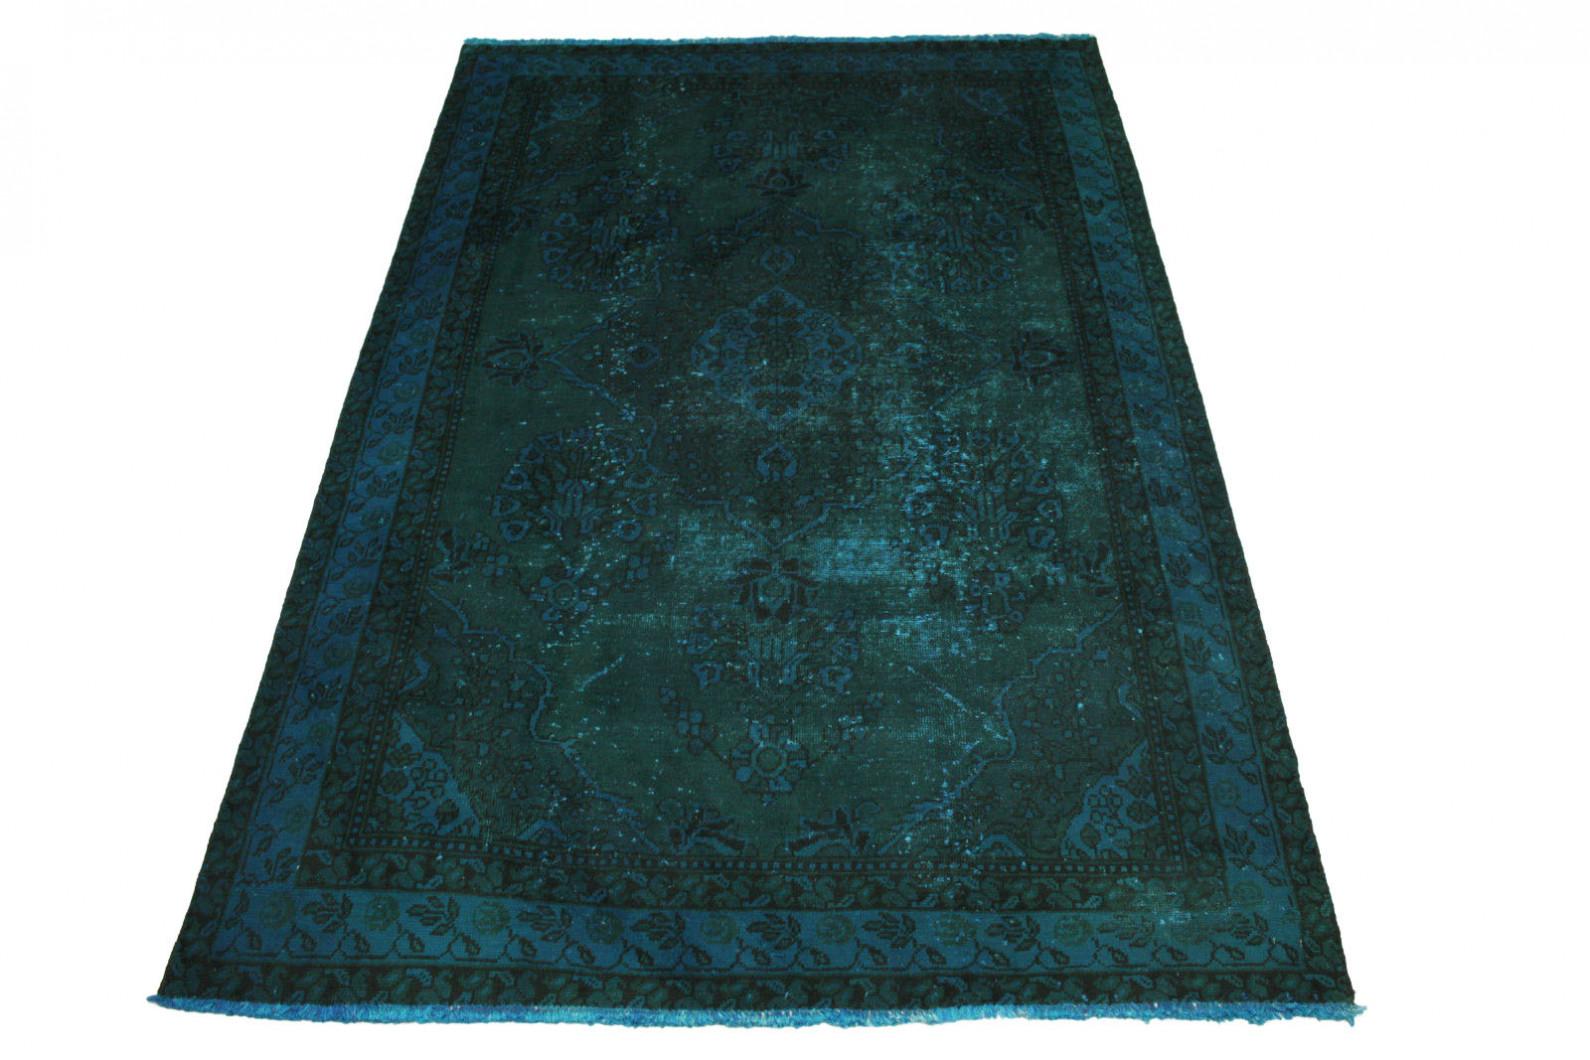 vintage teppich blau t rkis in 270x180cm 1001 3164 bei. Black Bedroom Furniture Sets. Home Design Ideas